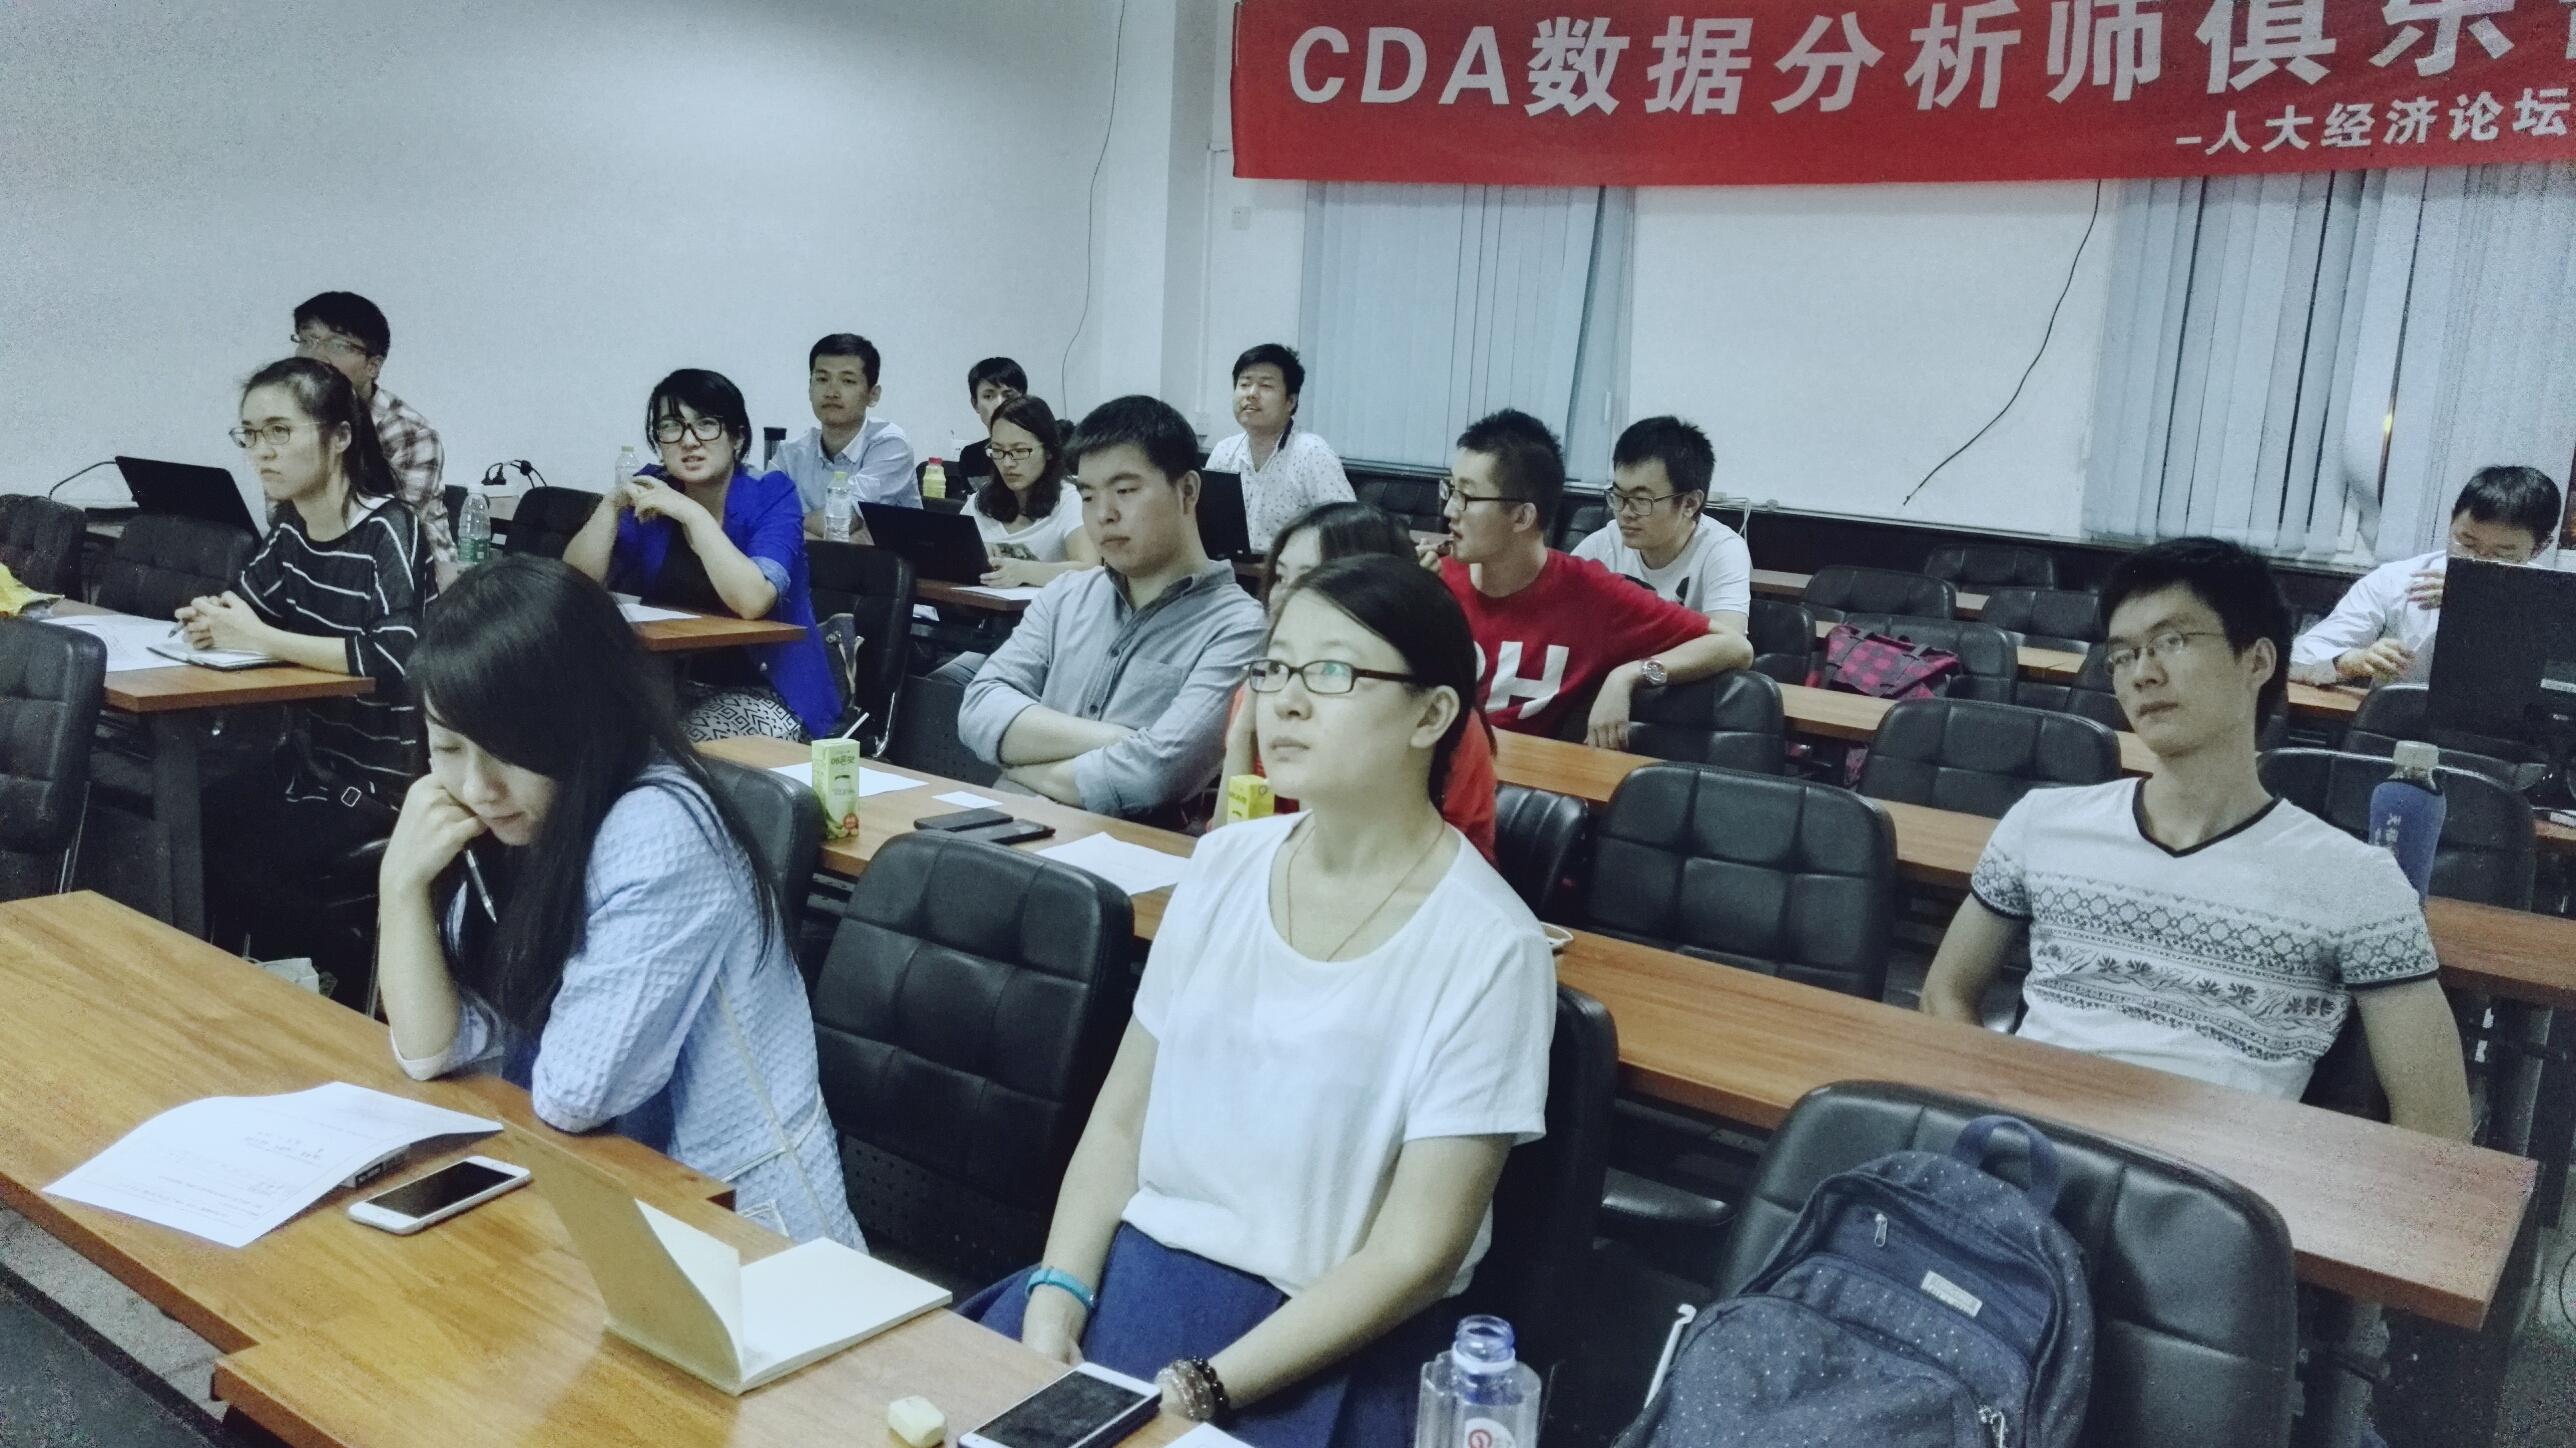 CDA数据分析师俱乐部(第21期)北京聚会回顾!